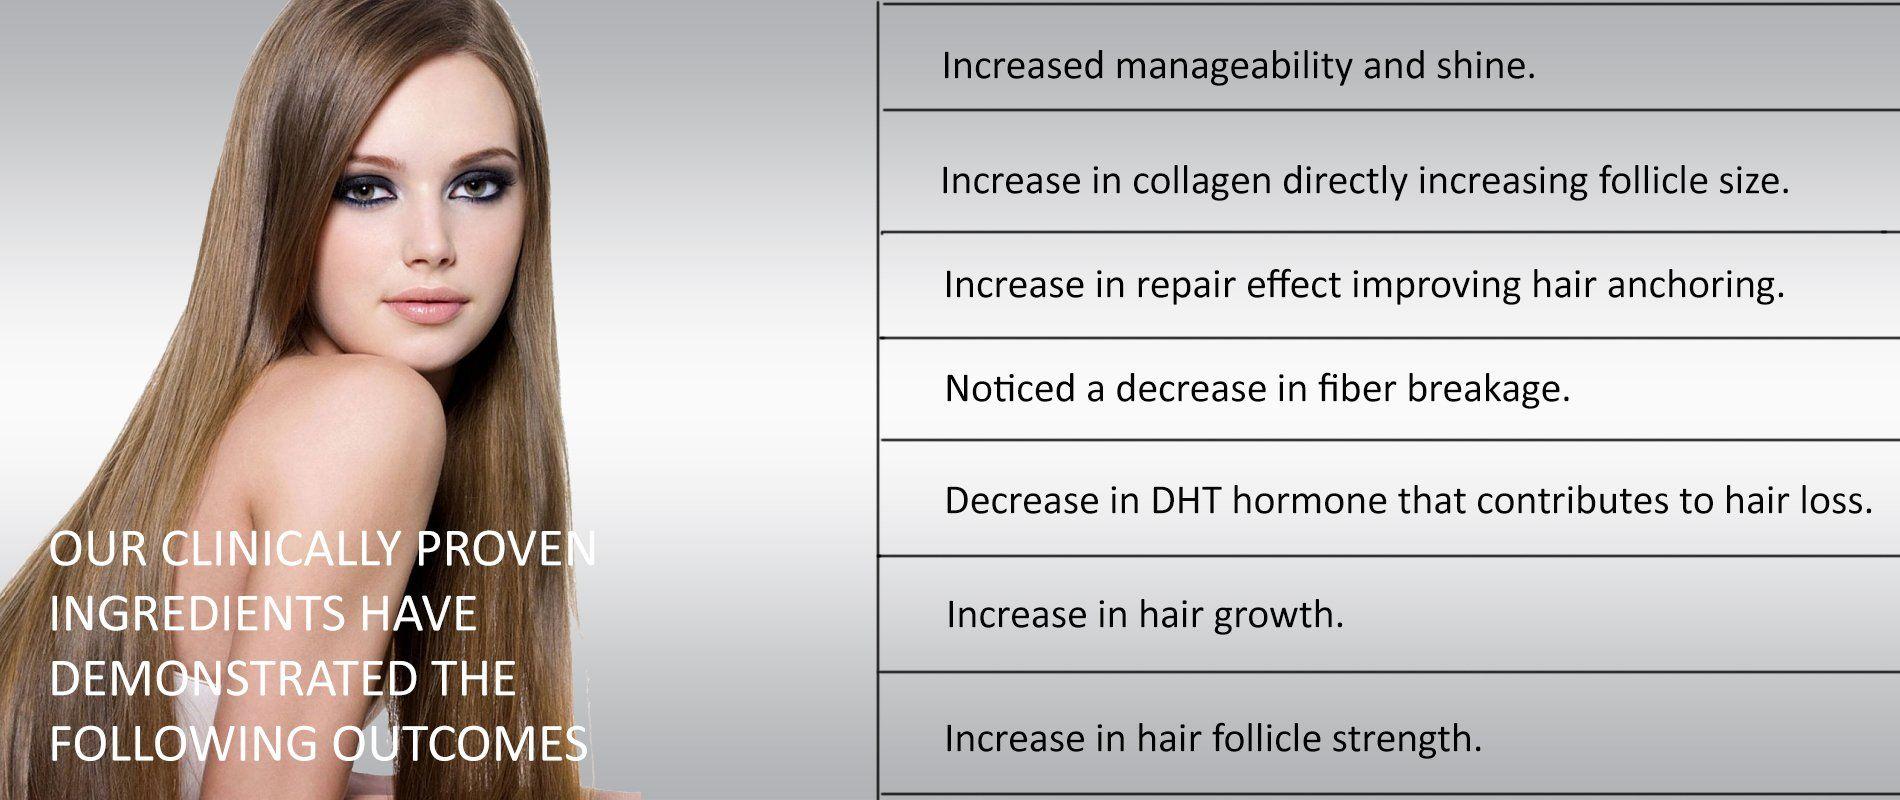 Hair Restore Shampoo And Conditioner Set Shampoo Conditioner Set Hair Restoration Help Hair Loss